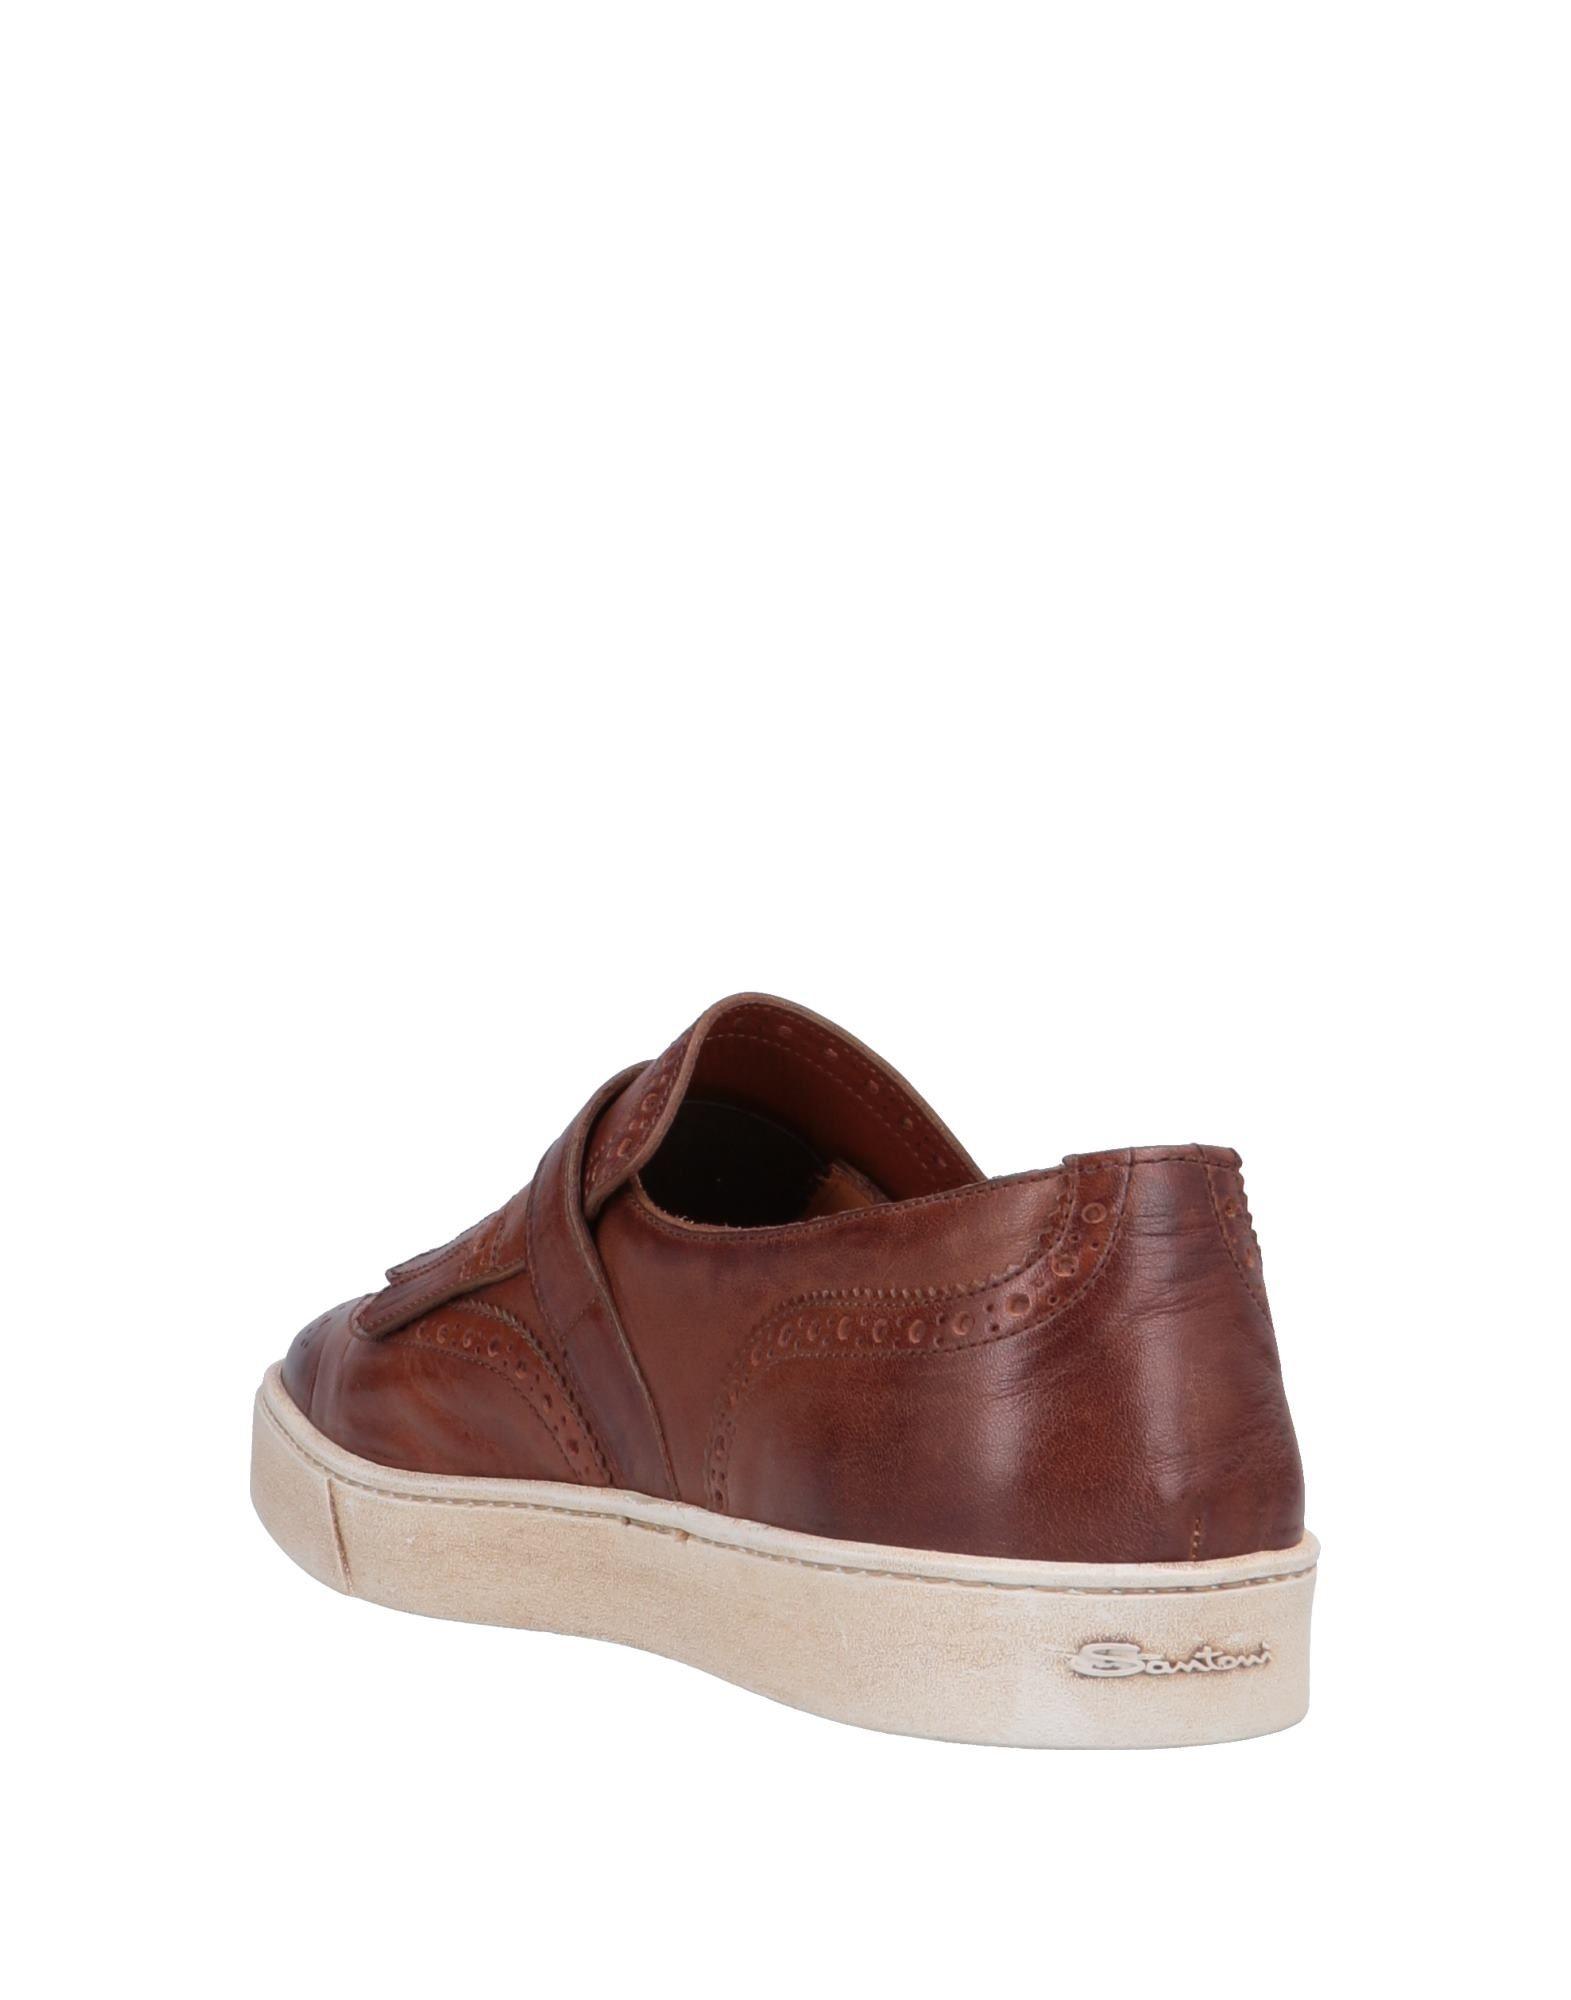 Santoni Sneakers Herren  beliebte 11554672PR Gute Qualität beliebte  Schuhe 6f90af